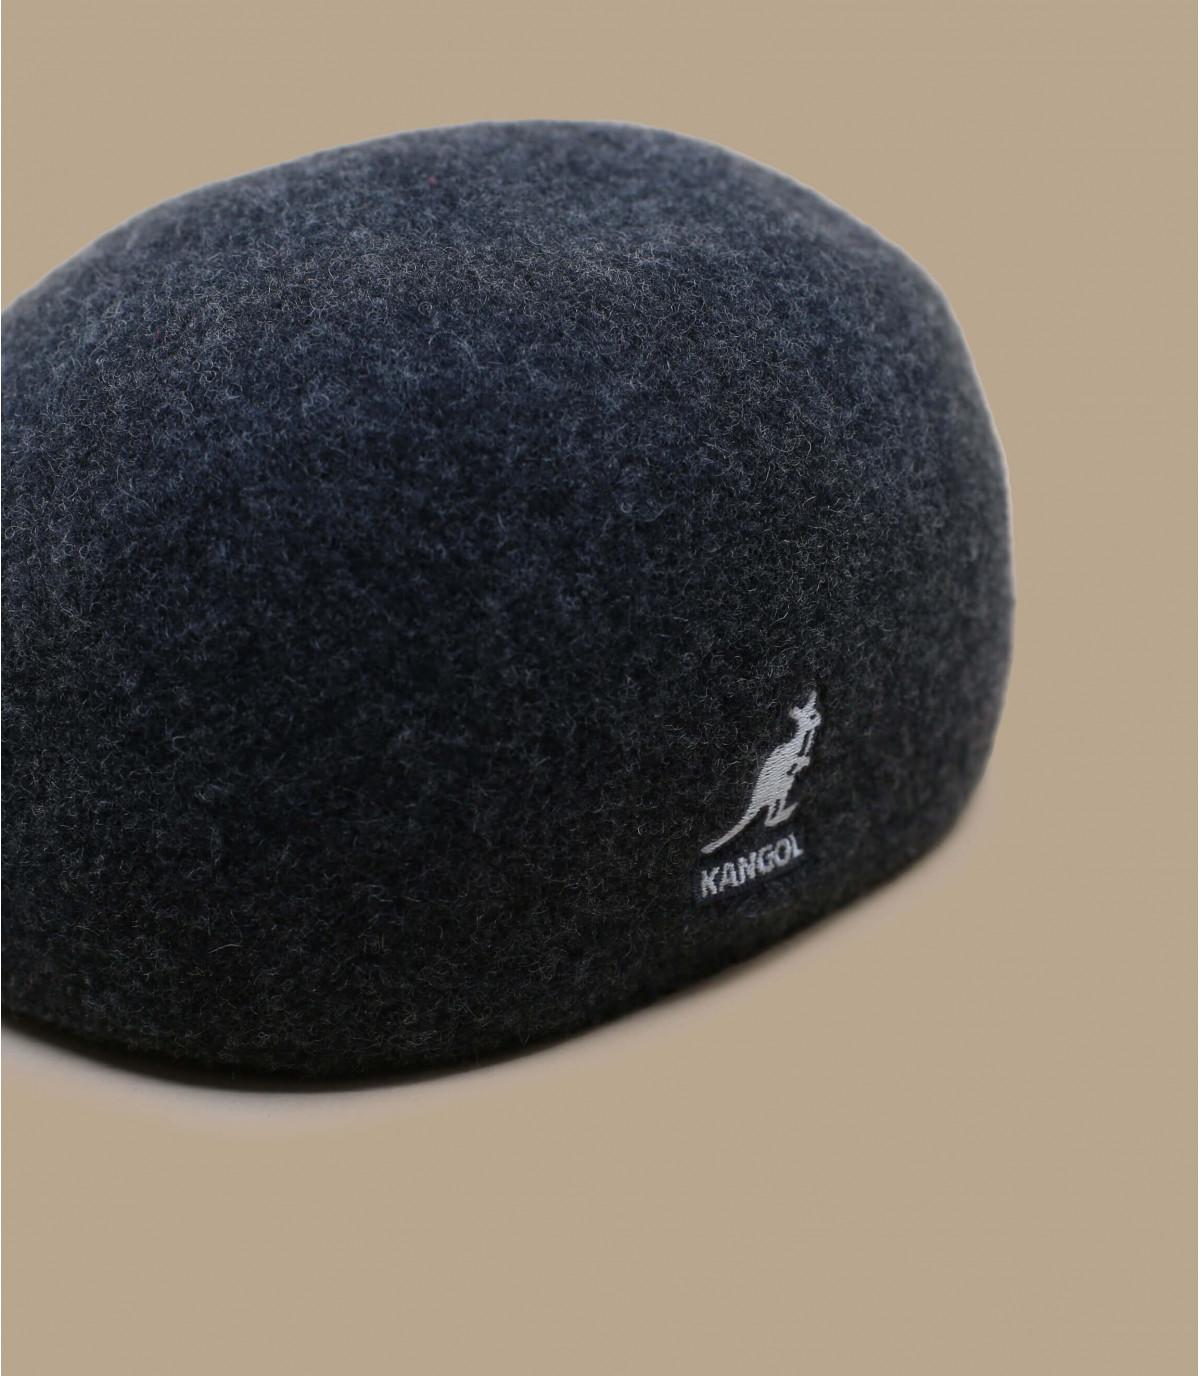 Détails 507 Wool seamless dk flannel - image 3